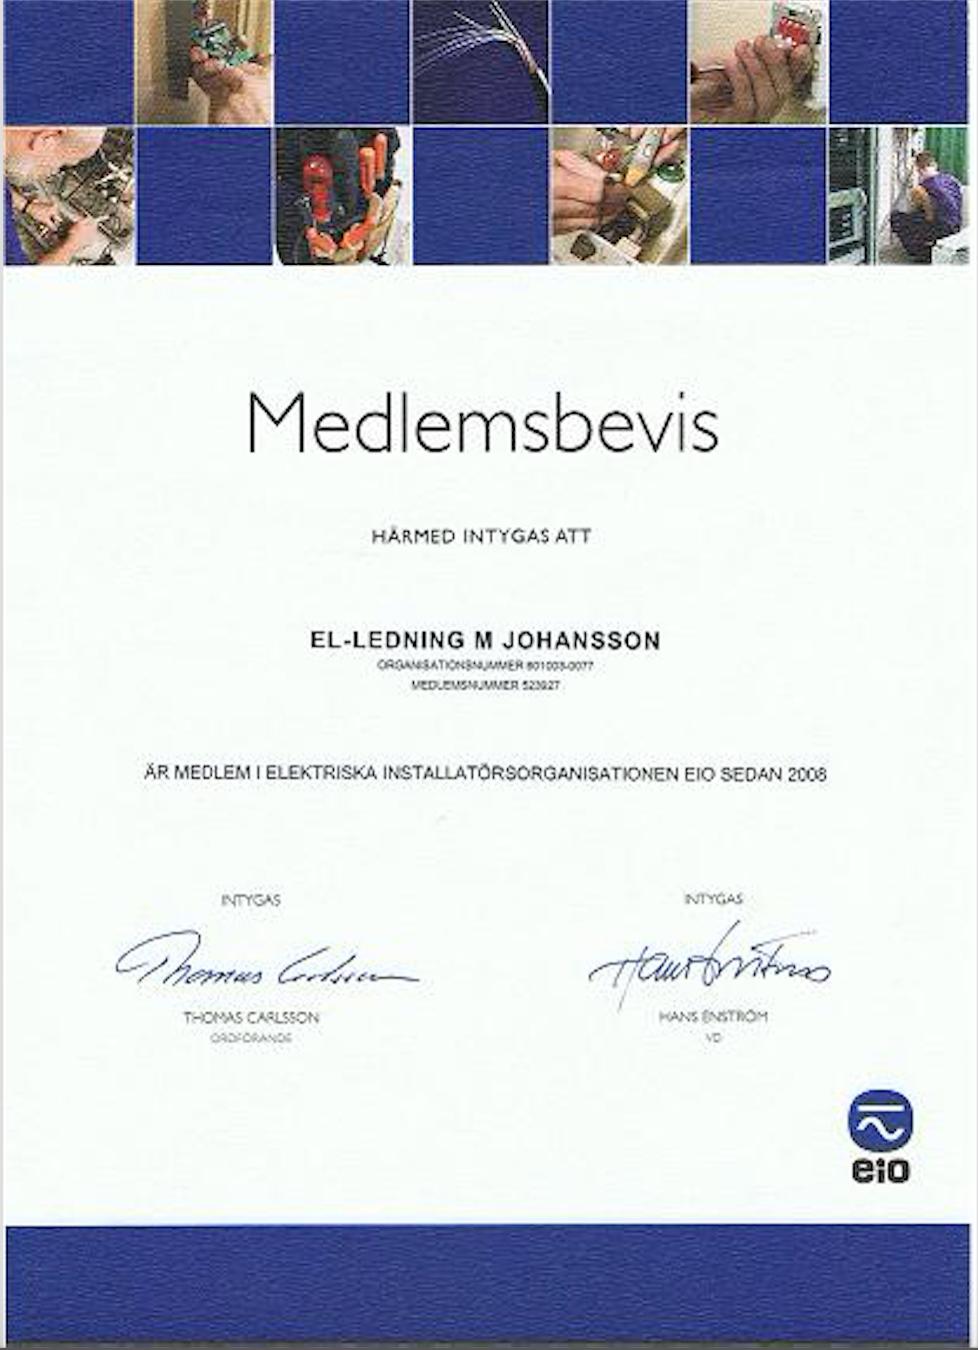 EL-Ledning M.Johansson